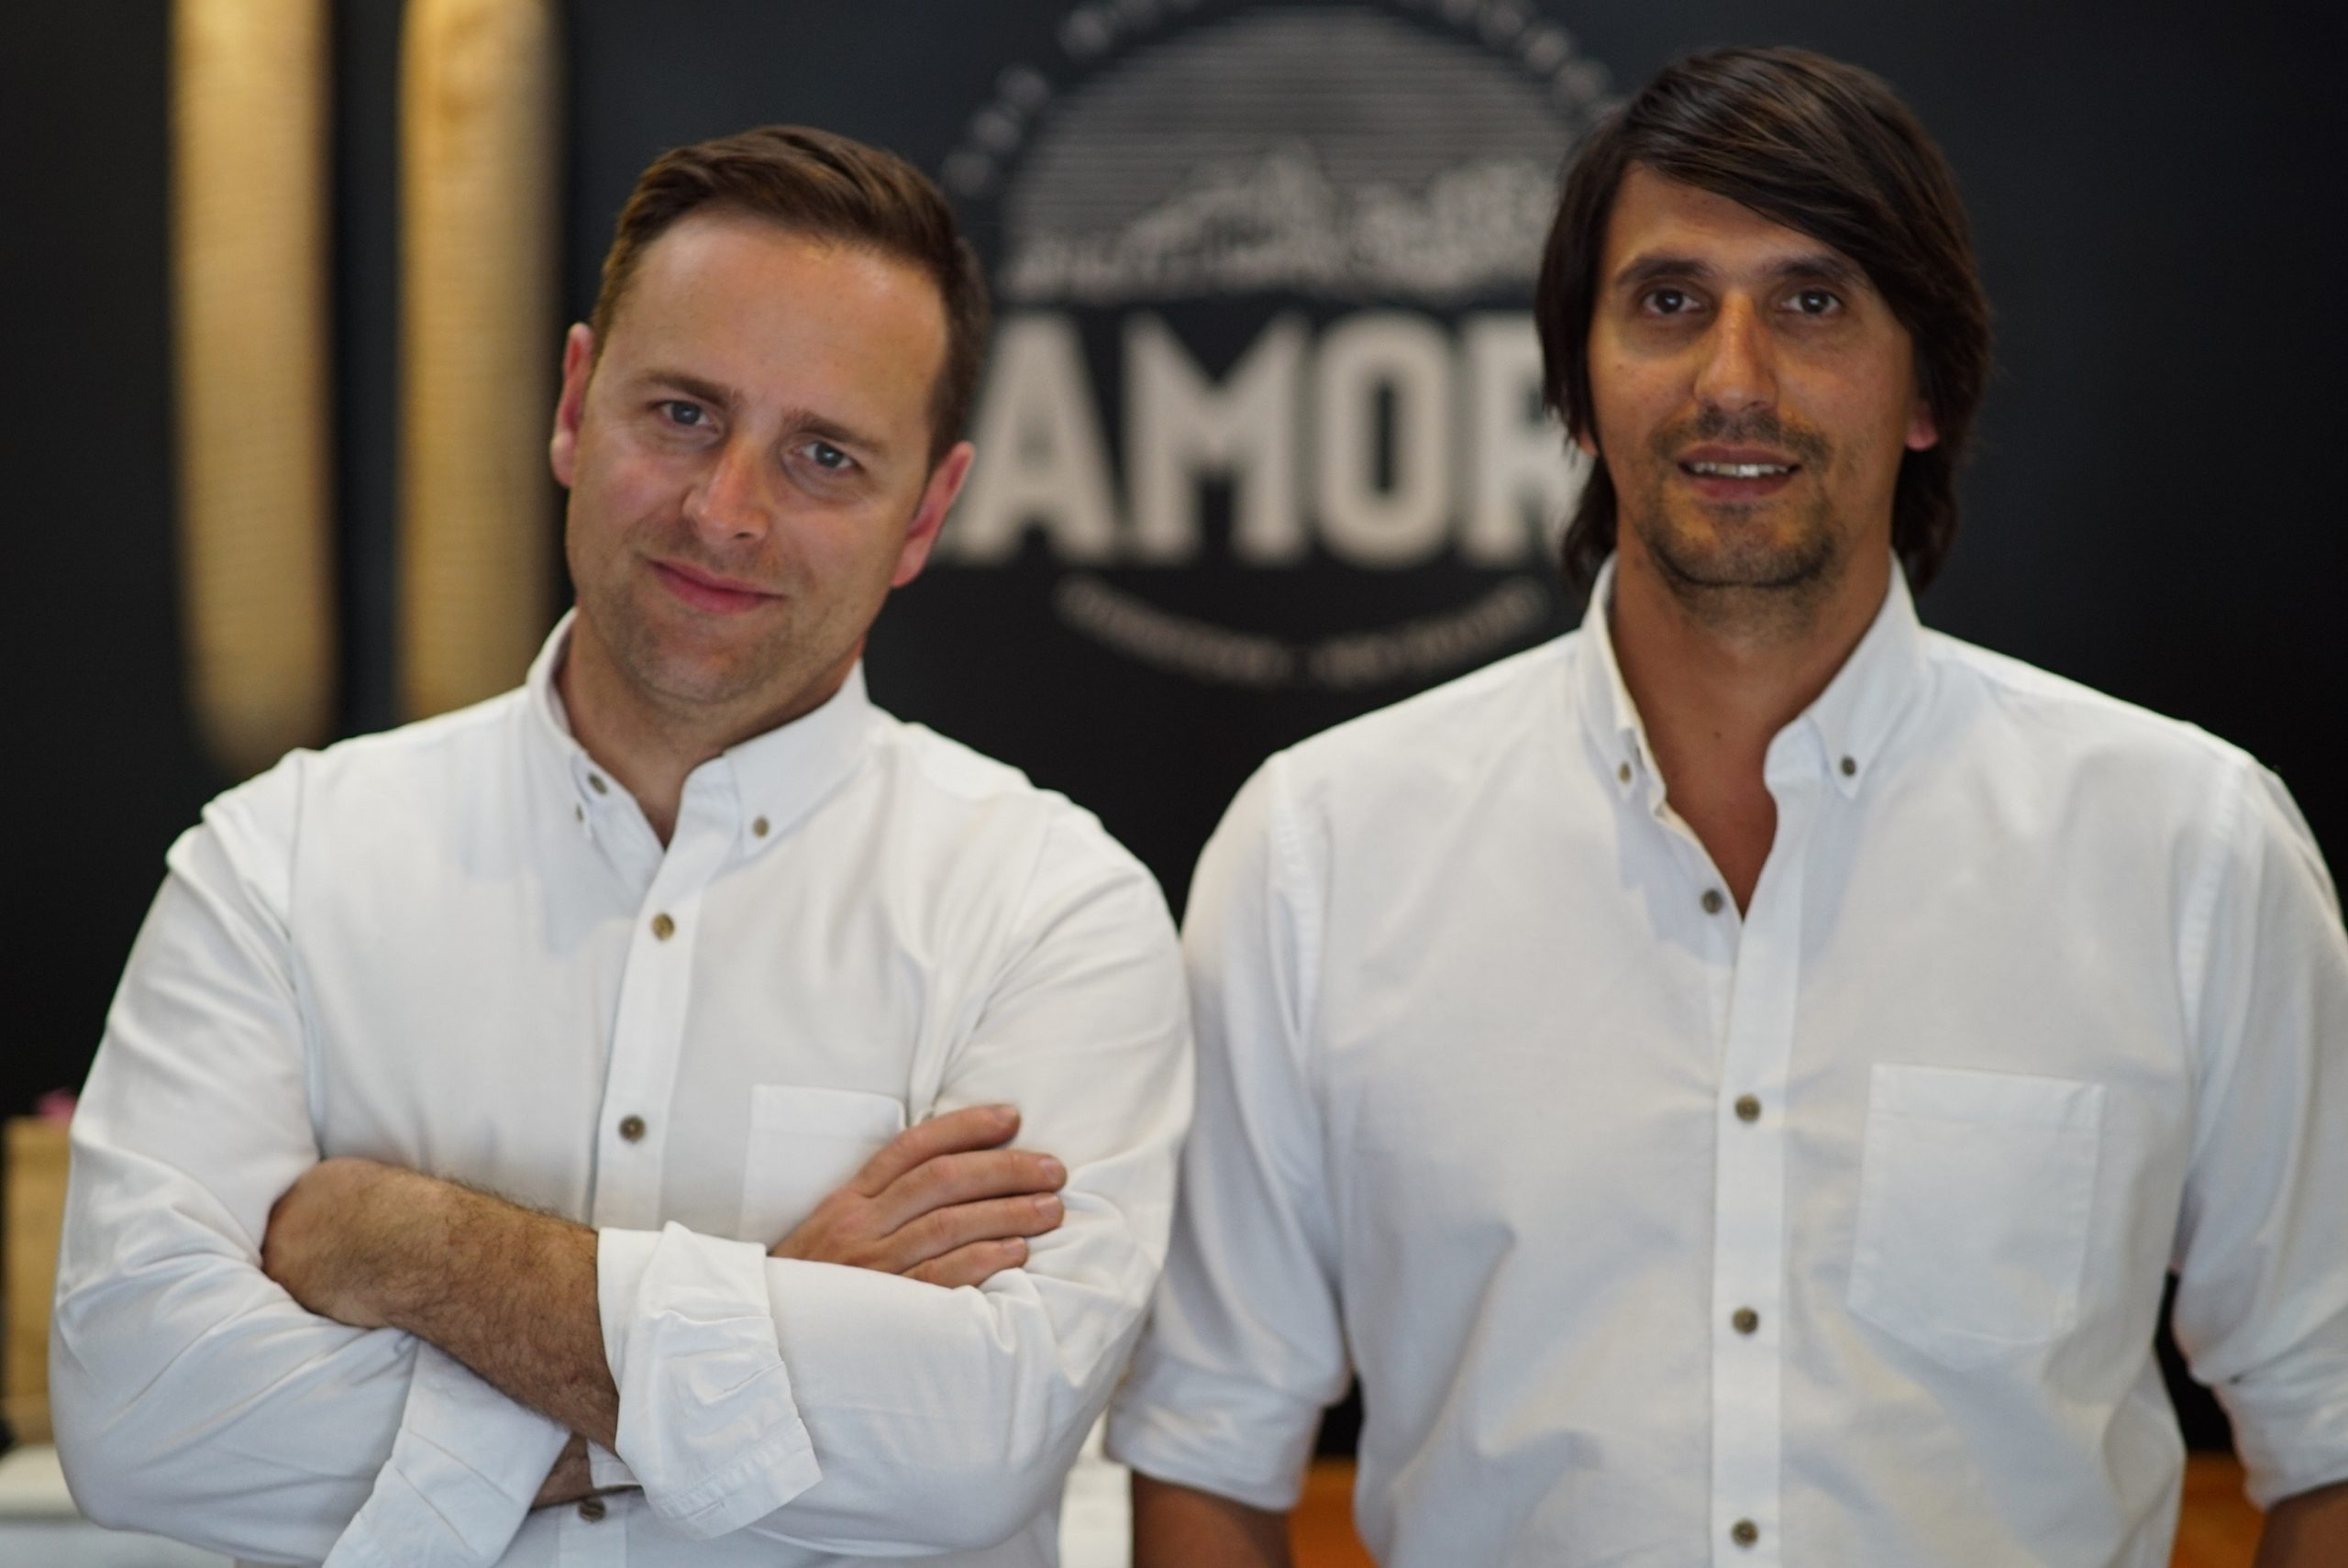 Zamora's directors Nicolas Karlsson (L) and Matias Mautone (R)